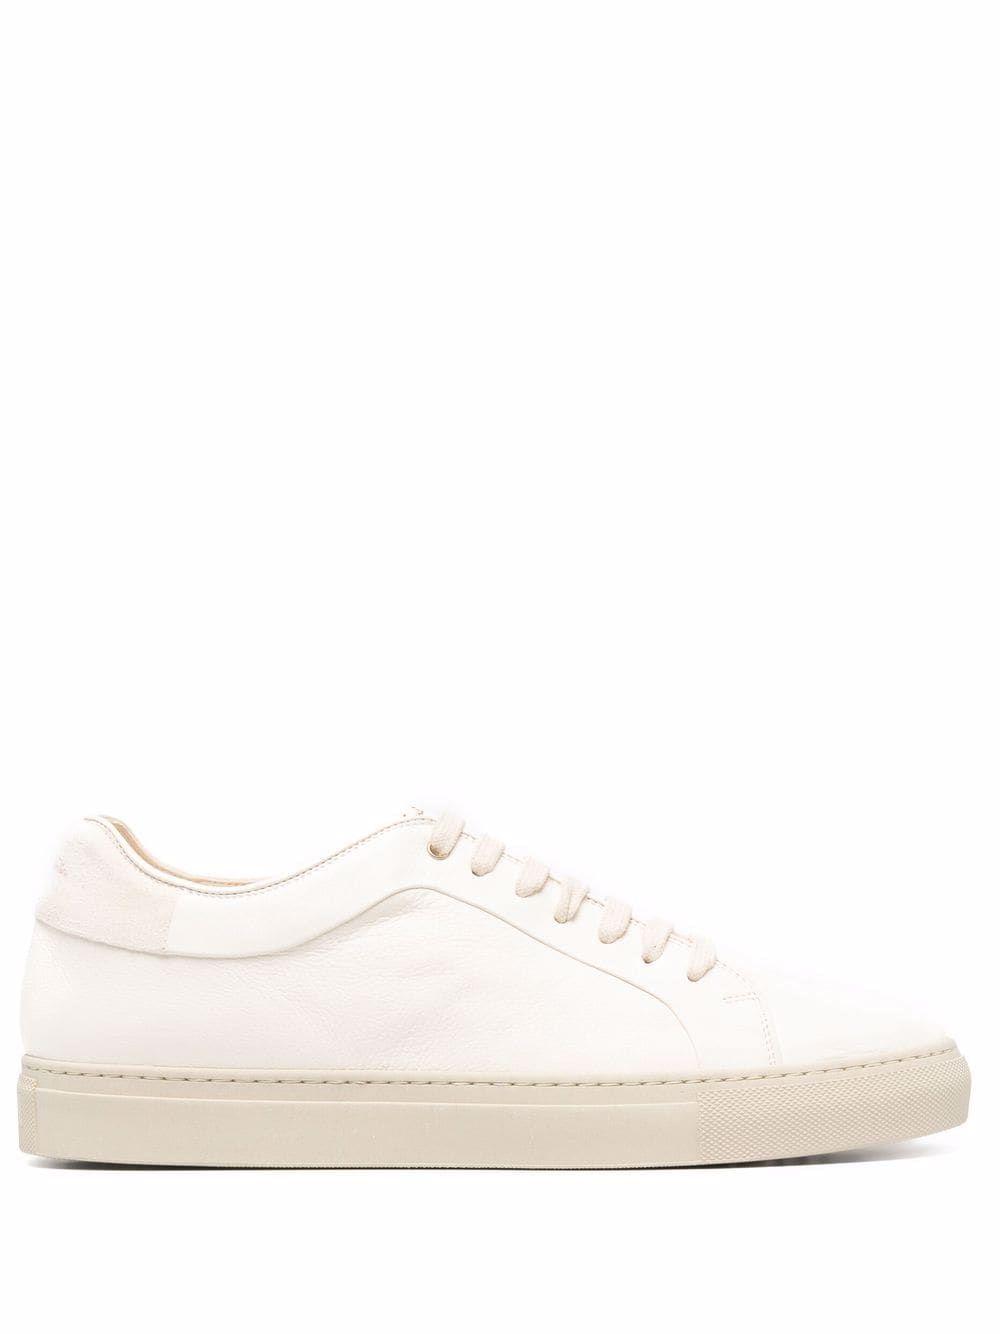 Paul smith sneakers bianco